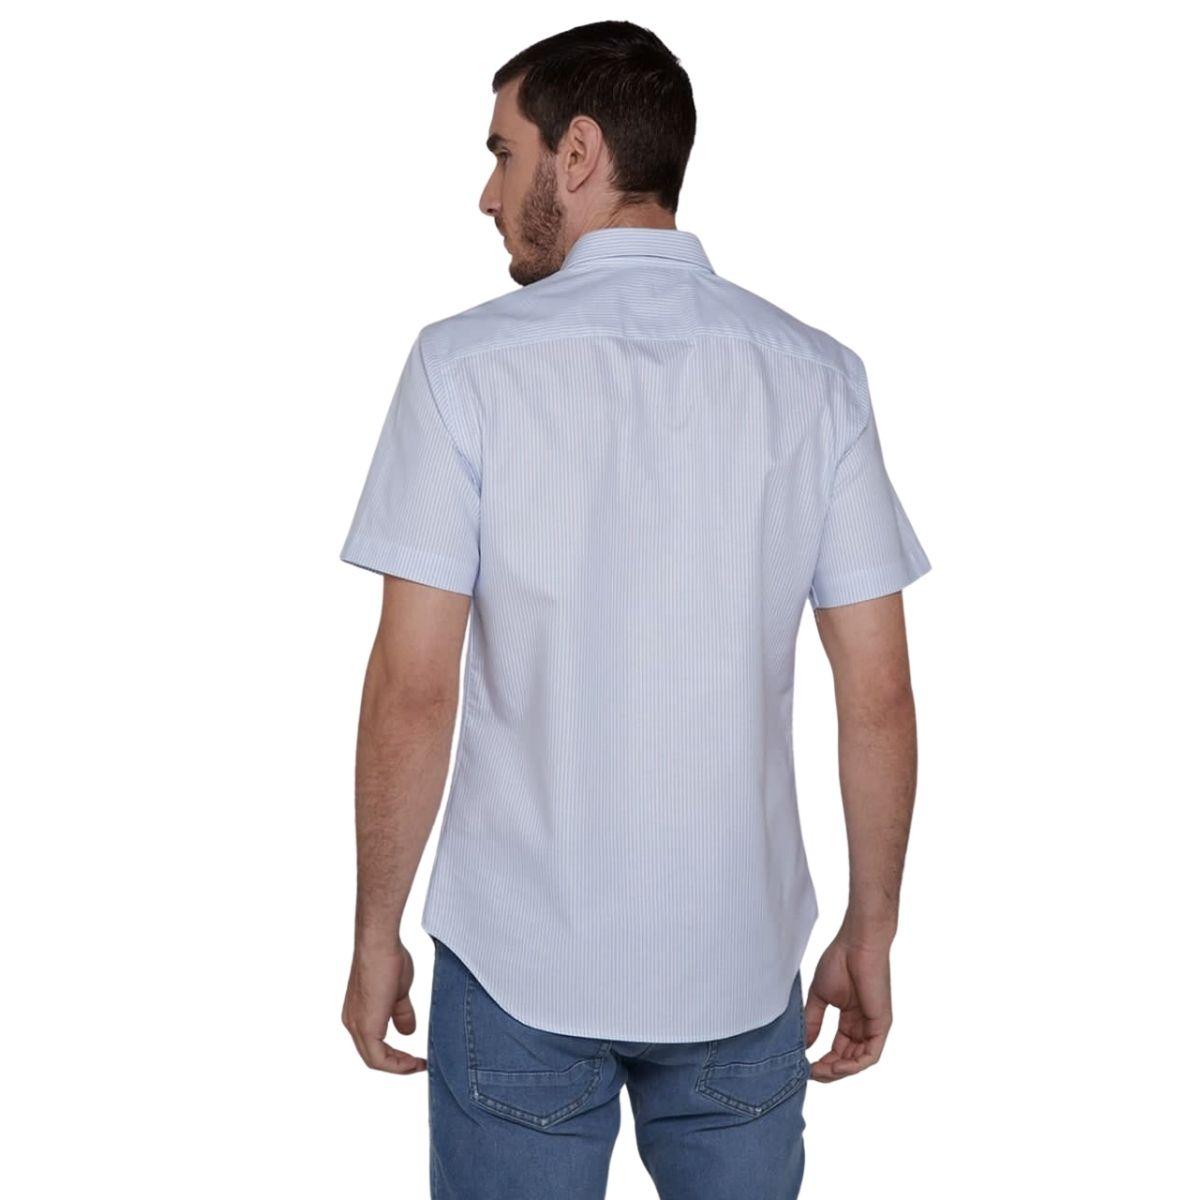 Camisa Dudalina Manga Curta Fio Tinto Listrada